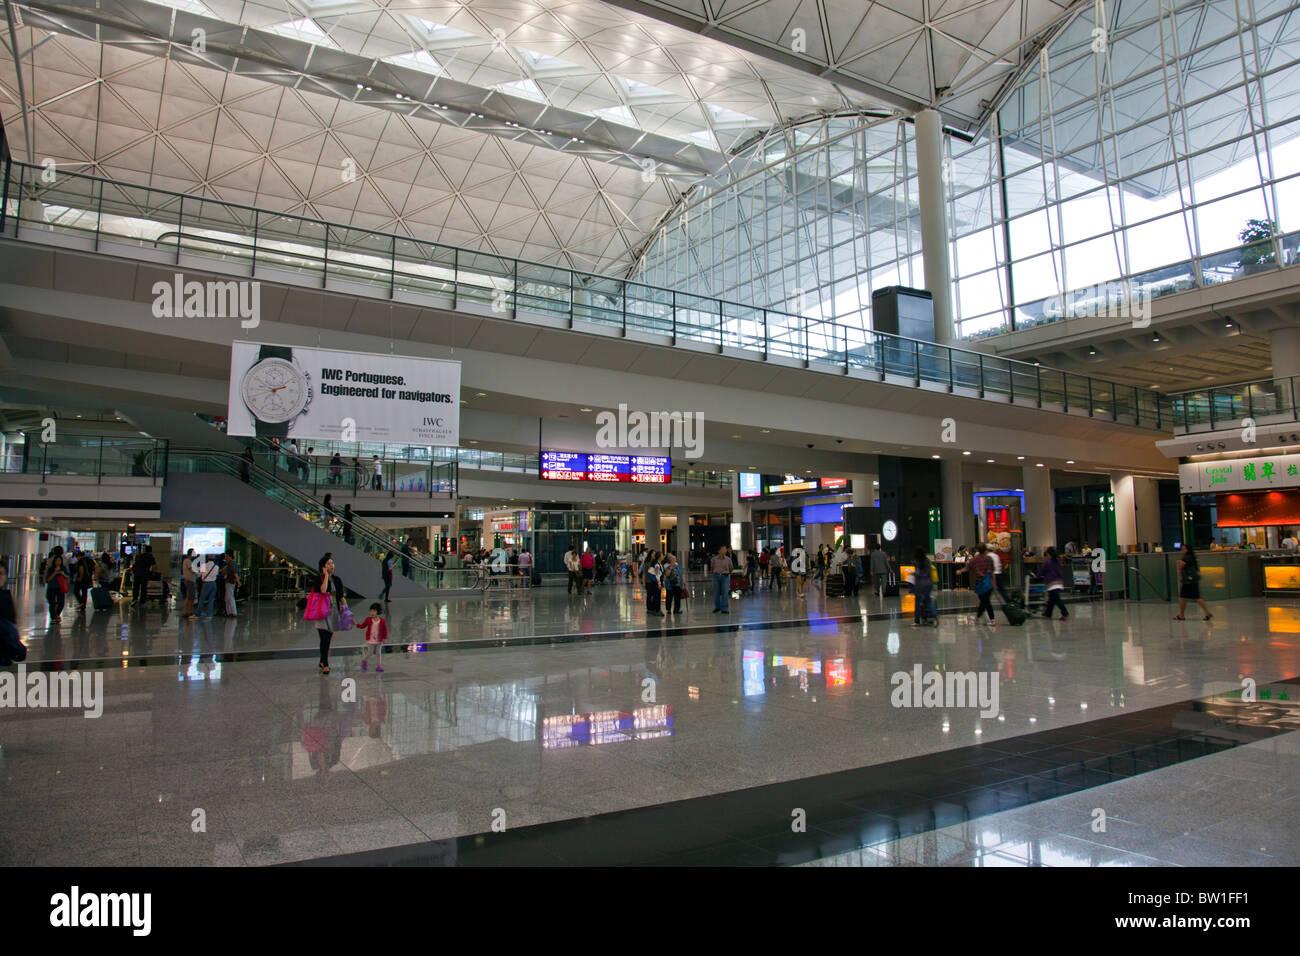 Hong Kong International Airport Chek Lap Kok Airport inside interior Stock Photo